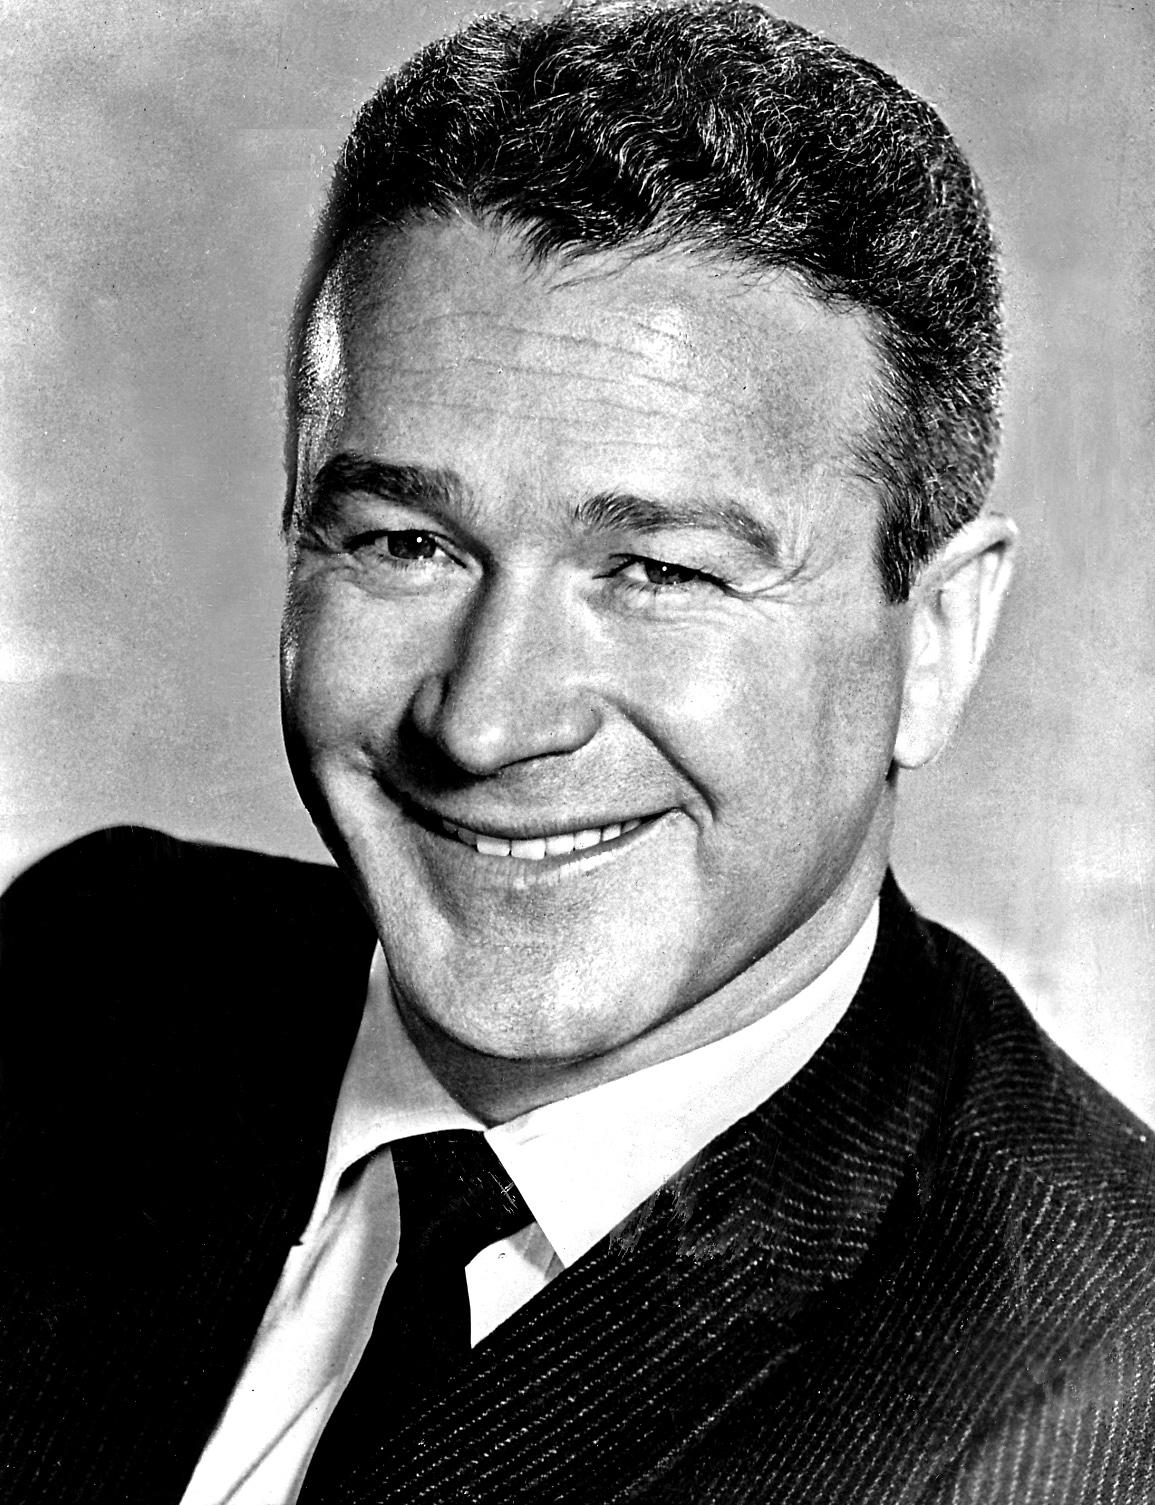 Red Buttons, Amerikalı aktör, komedyen (DY-1919) tarihte bugün